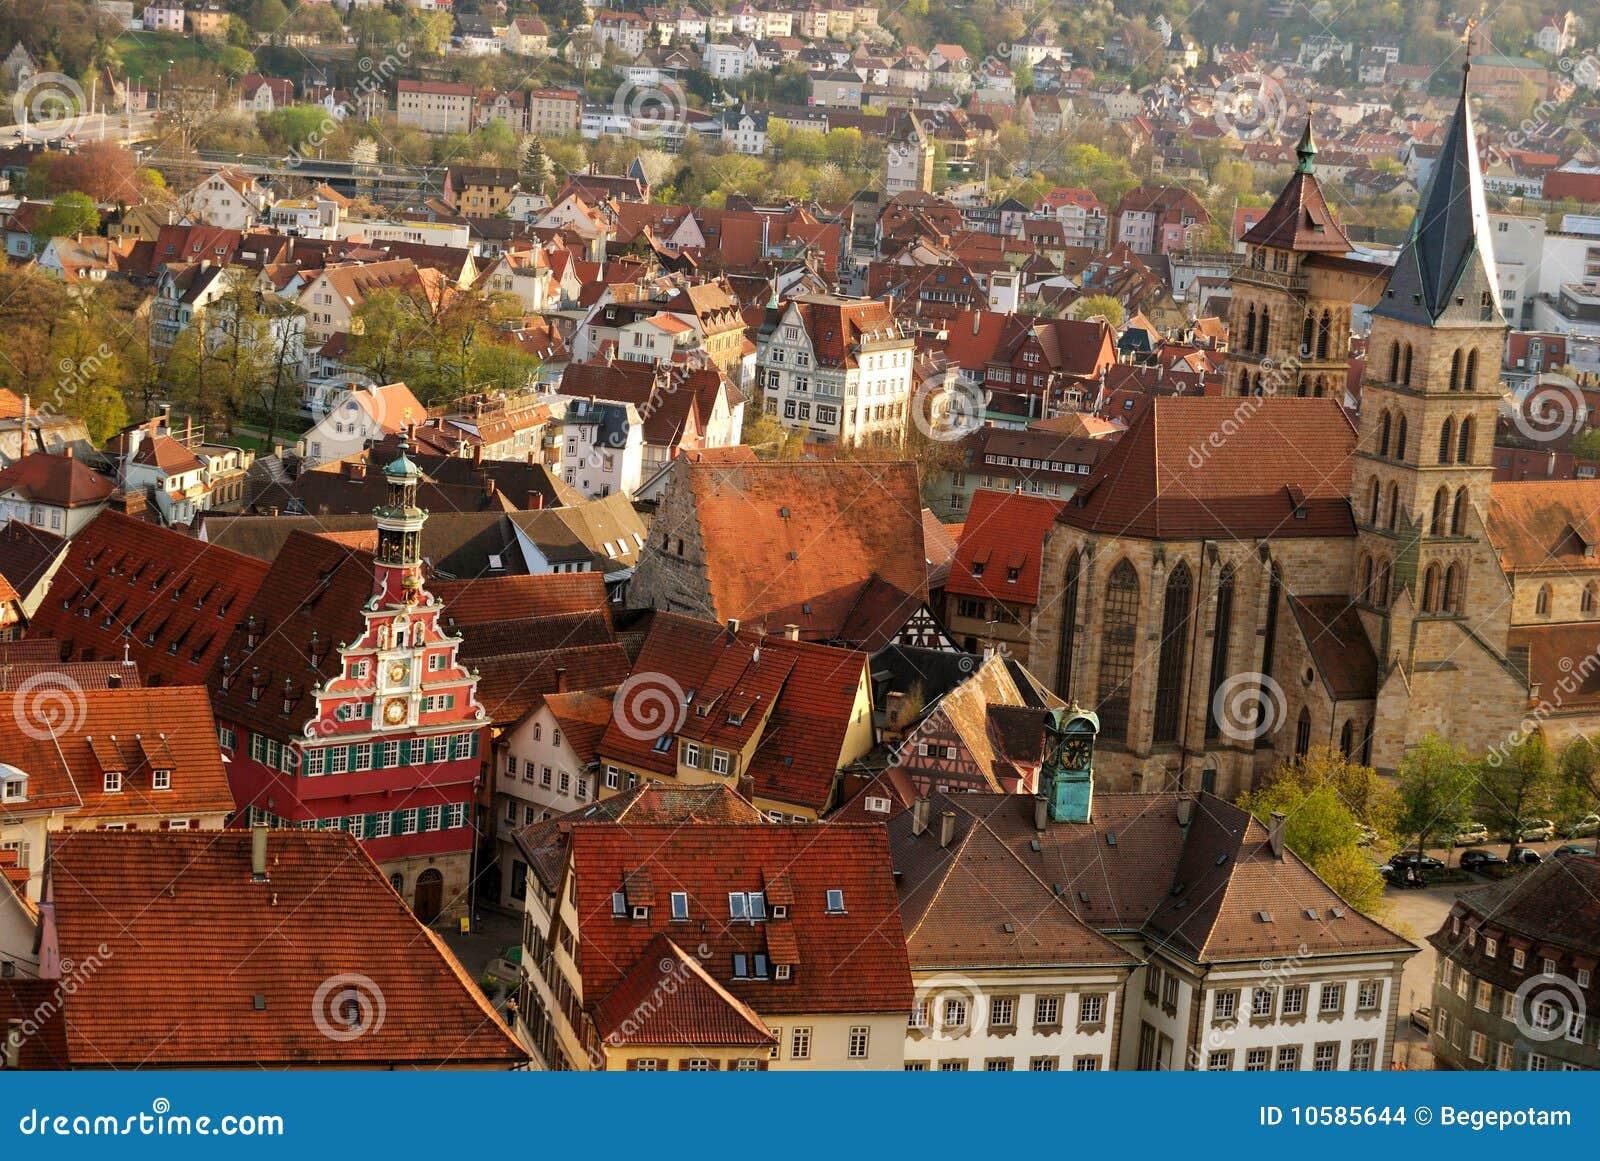 Stuttgart Esslingen Old Town Centre Stock Images Image